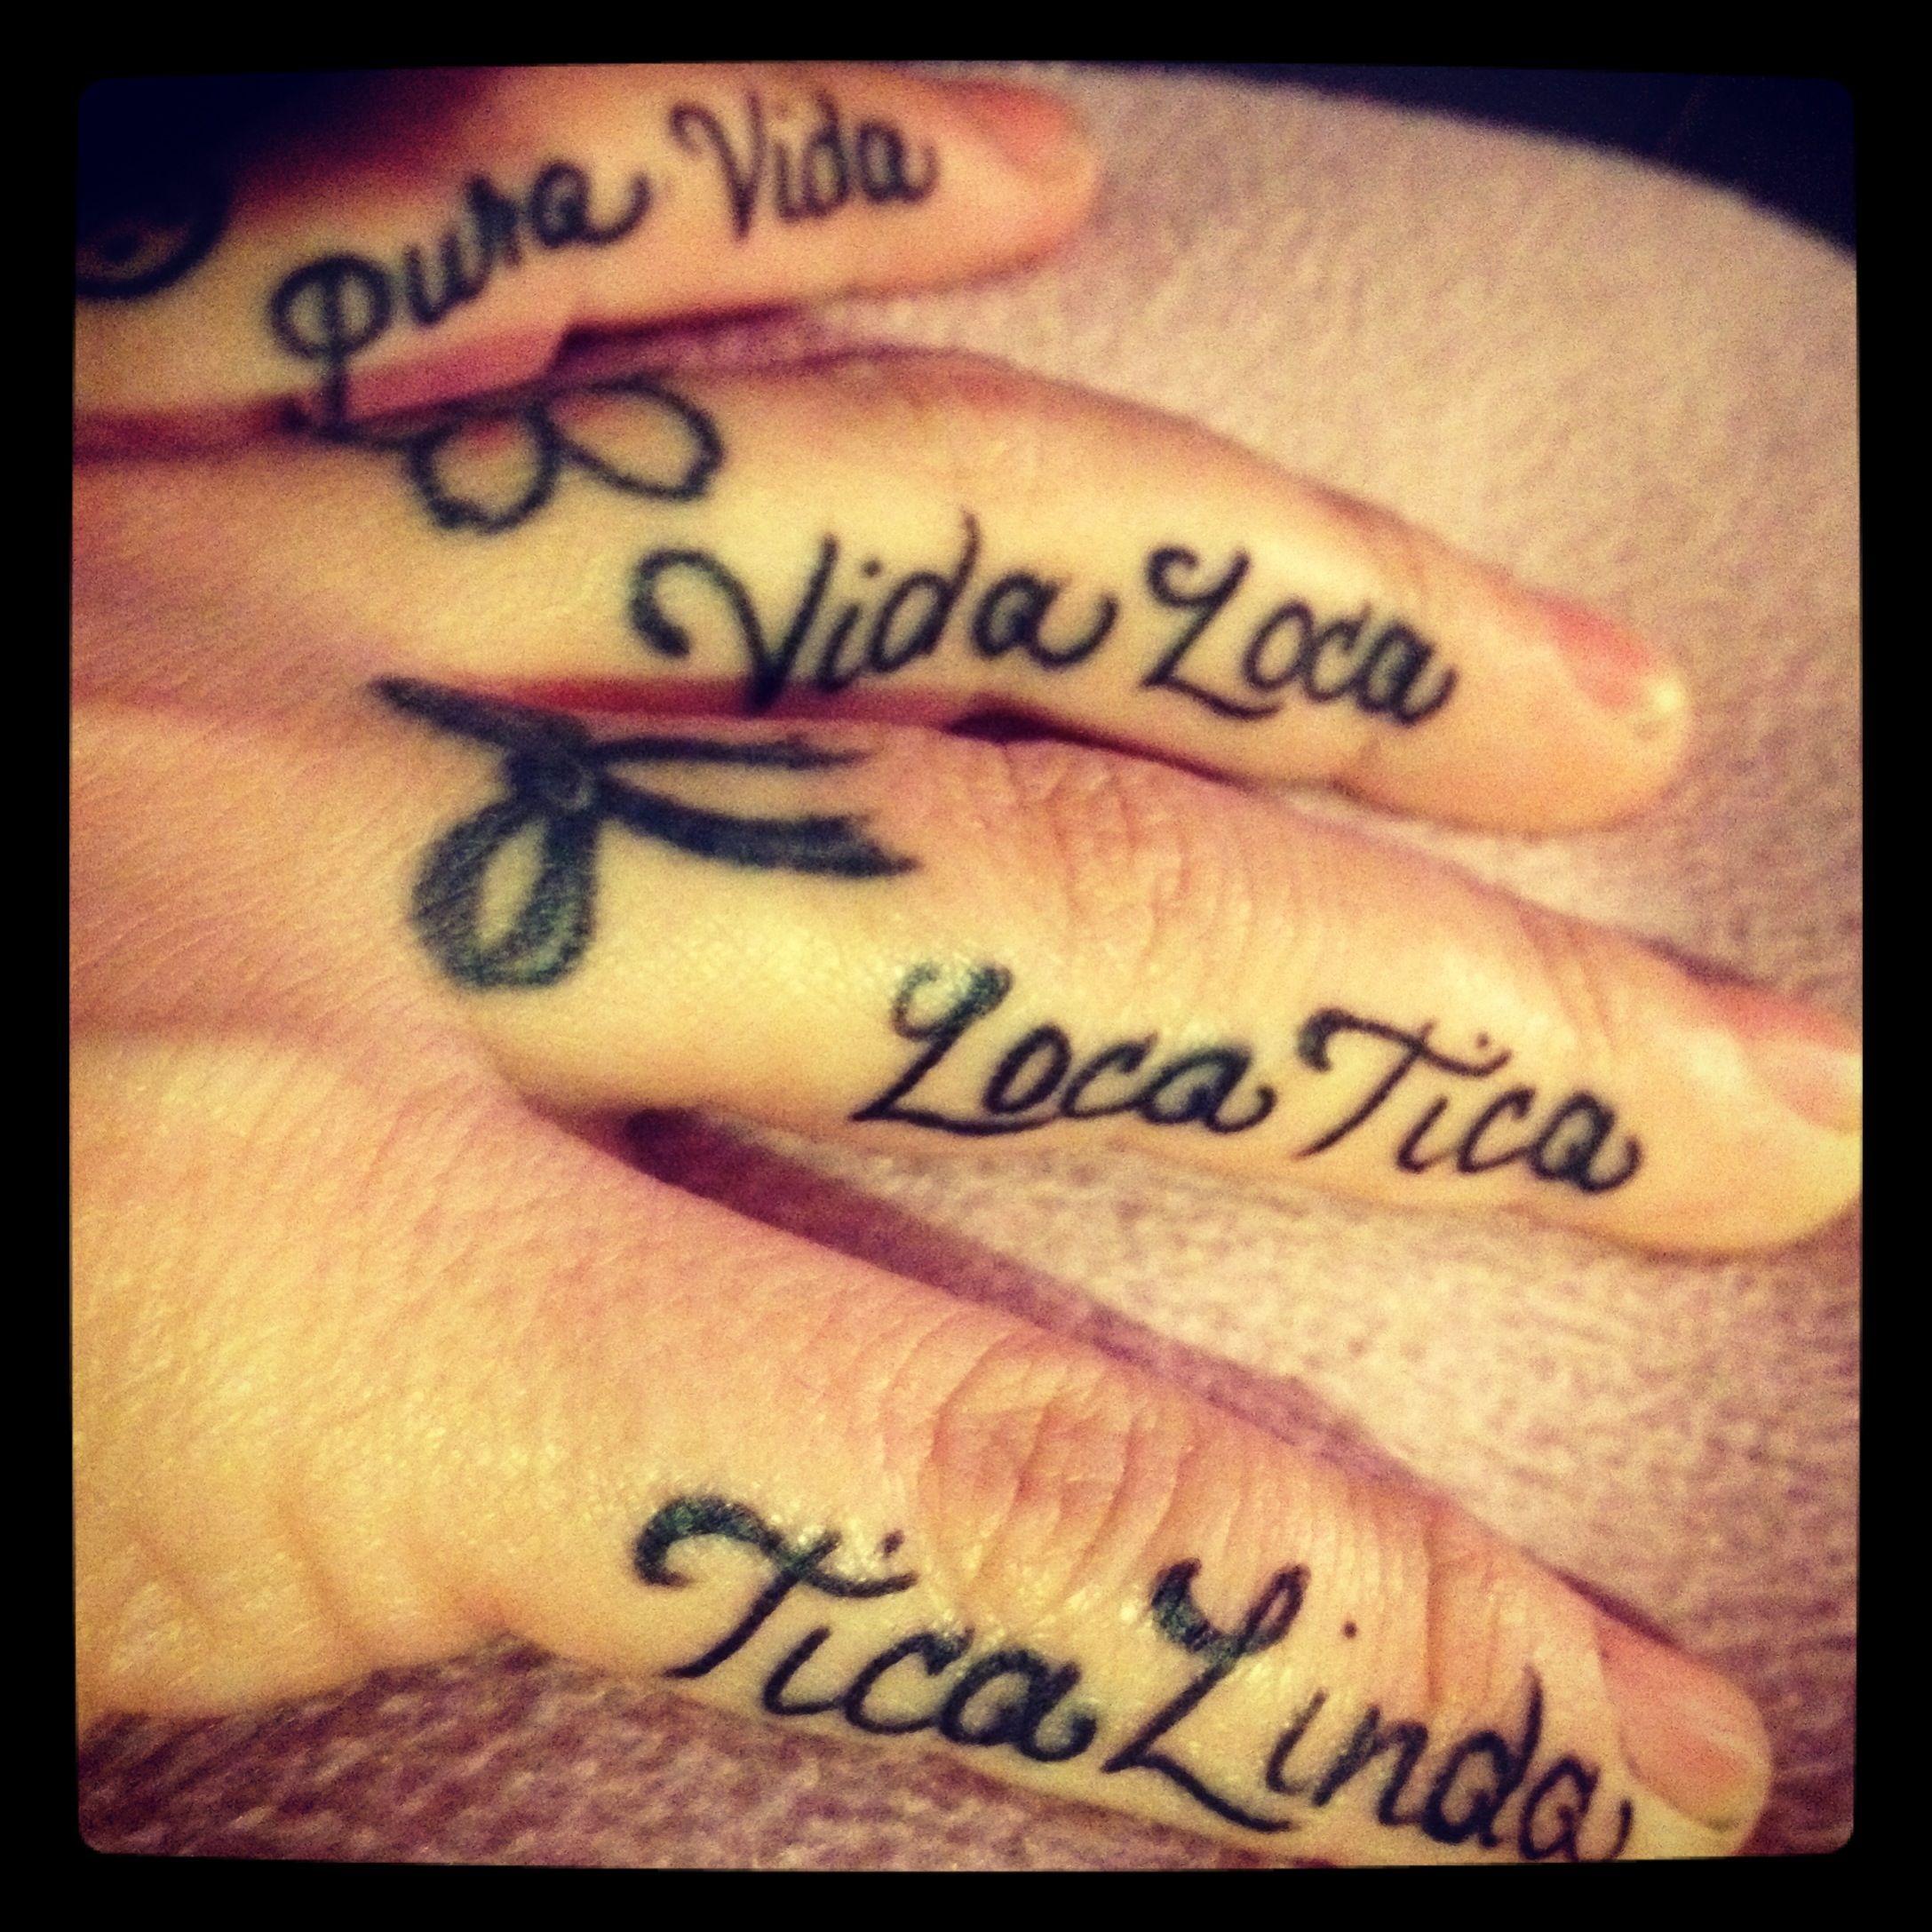 Tattoo Needle Quotes: Pura Vida Baby! Costa Rica